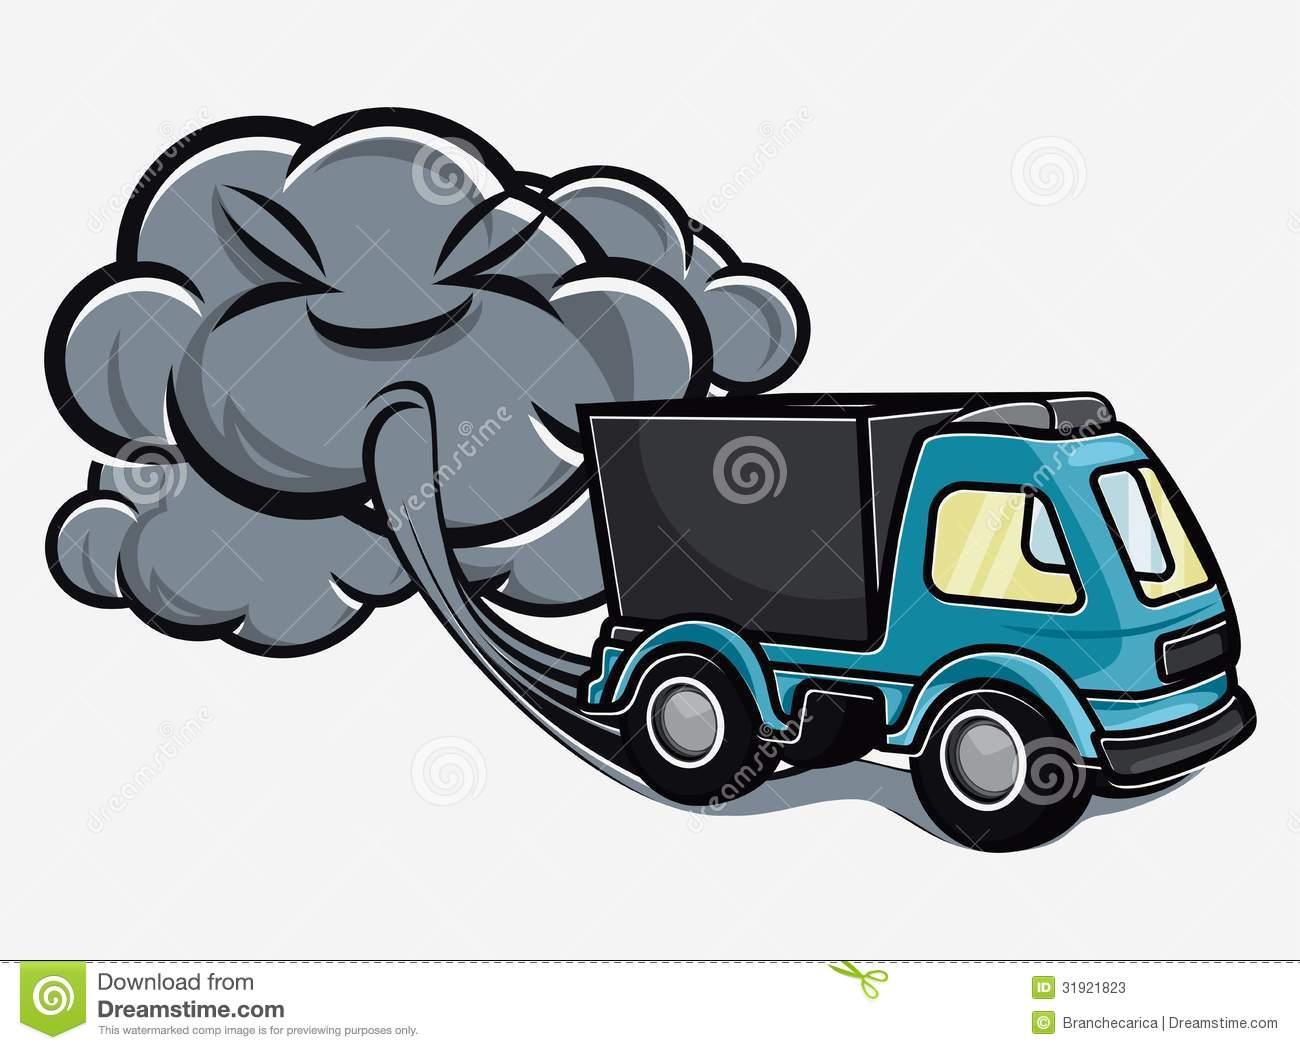 Car smoke car clipart clip free download Free Premium Cliparts - ClipartFest clip free download